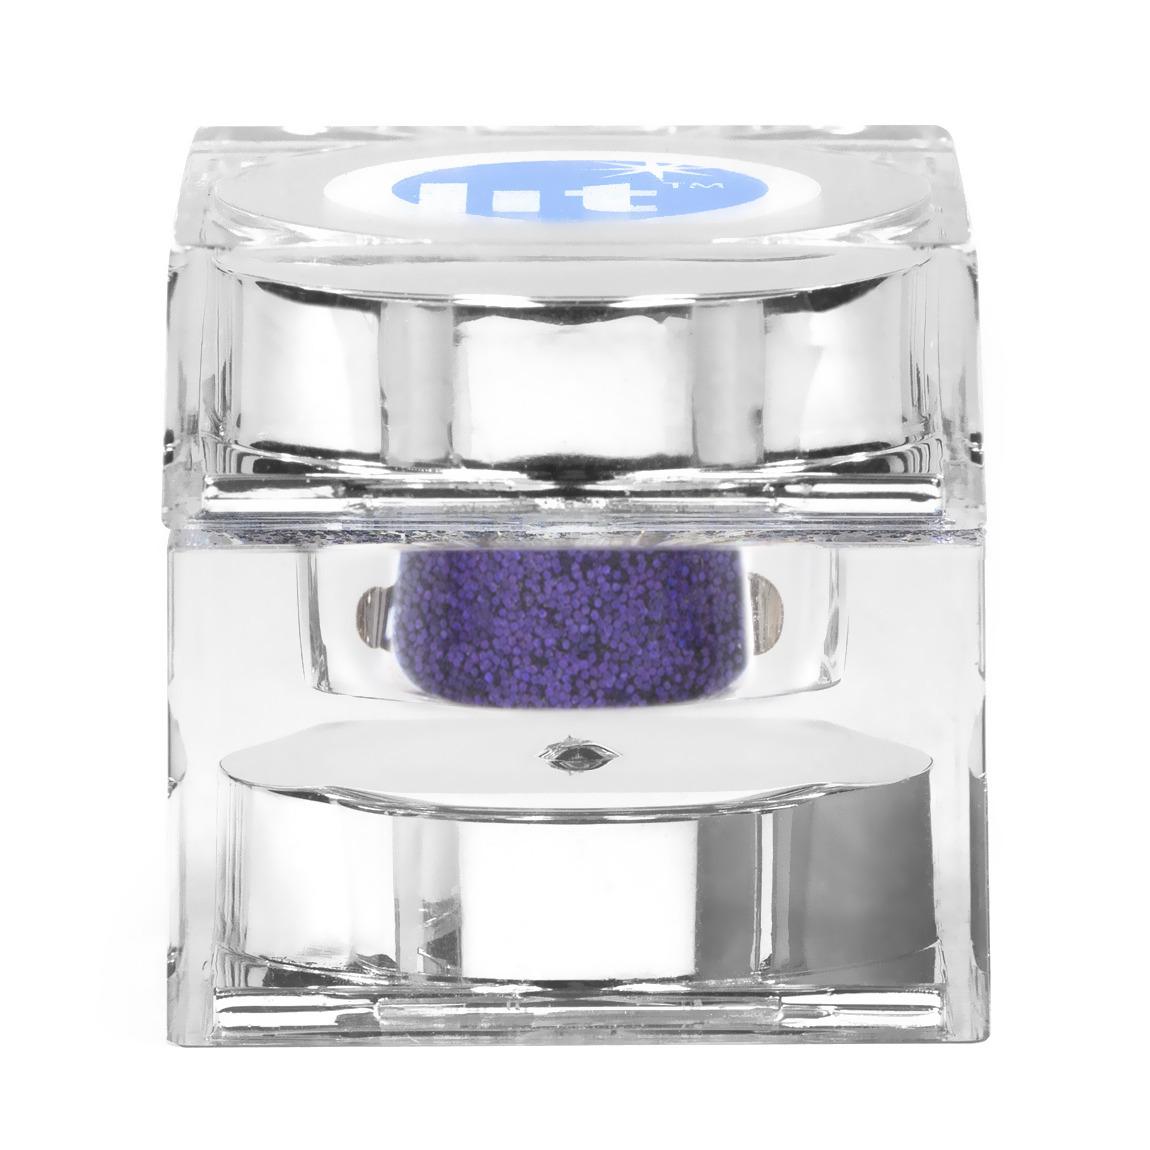 Lit Cosmetics Holographic Glitter Pigment Disco Diva S3